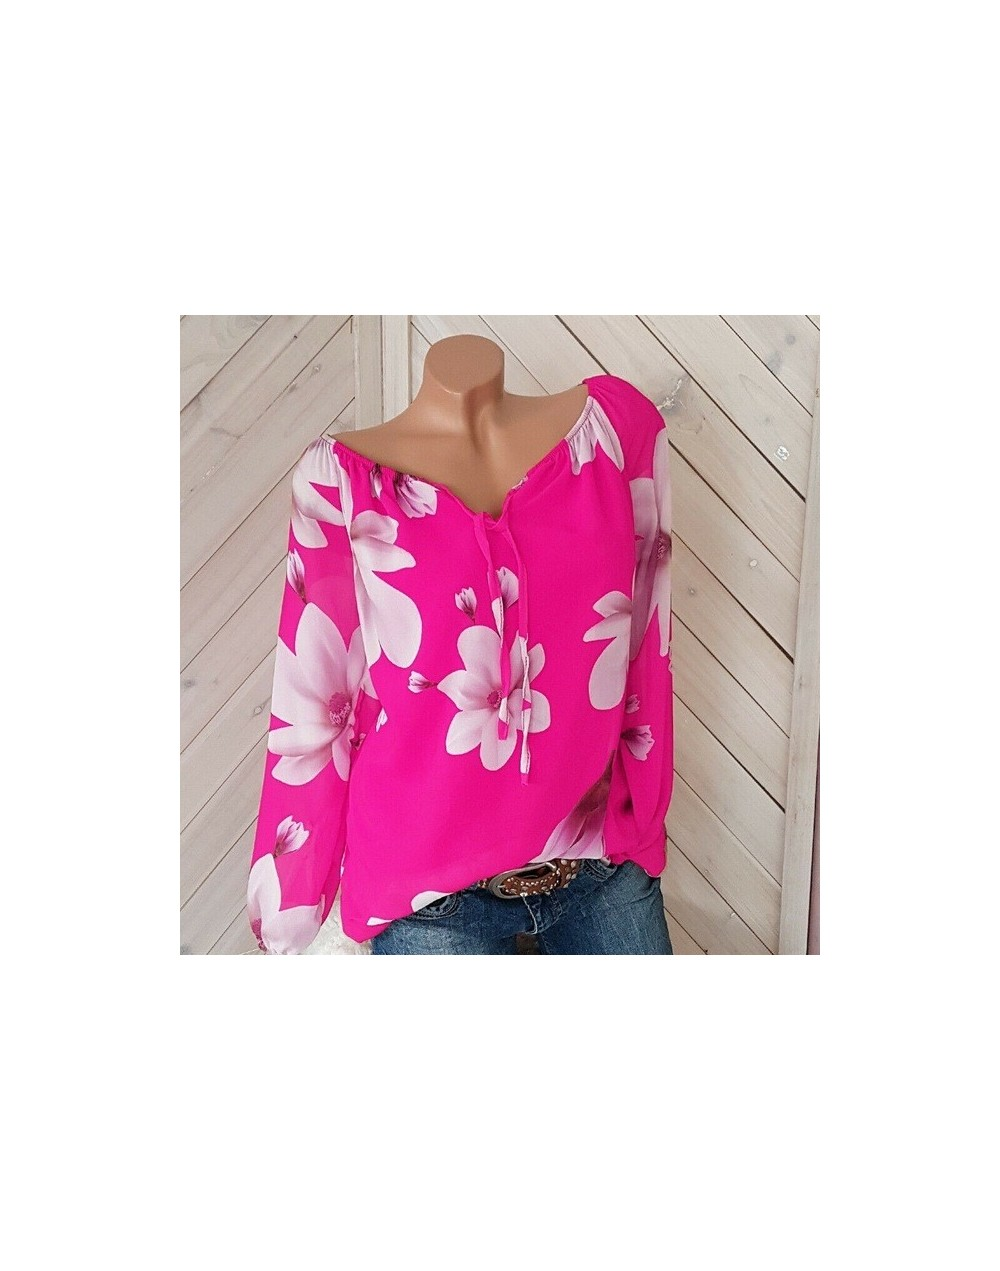 Long sleeve Chiffon Women Blouse And Tops 2019 Summer Beach Flroal Blouse Shirt Casual V Neck Female Loose Tops Blouses Shir...